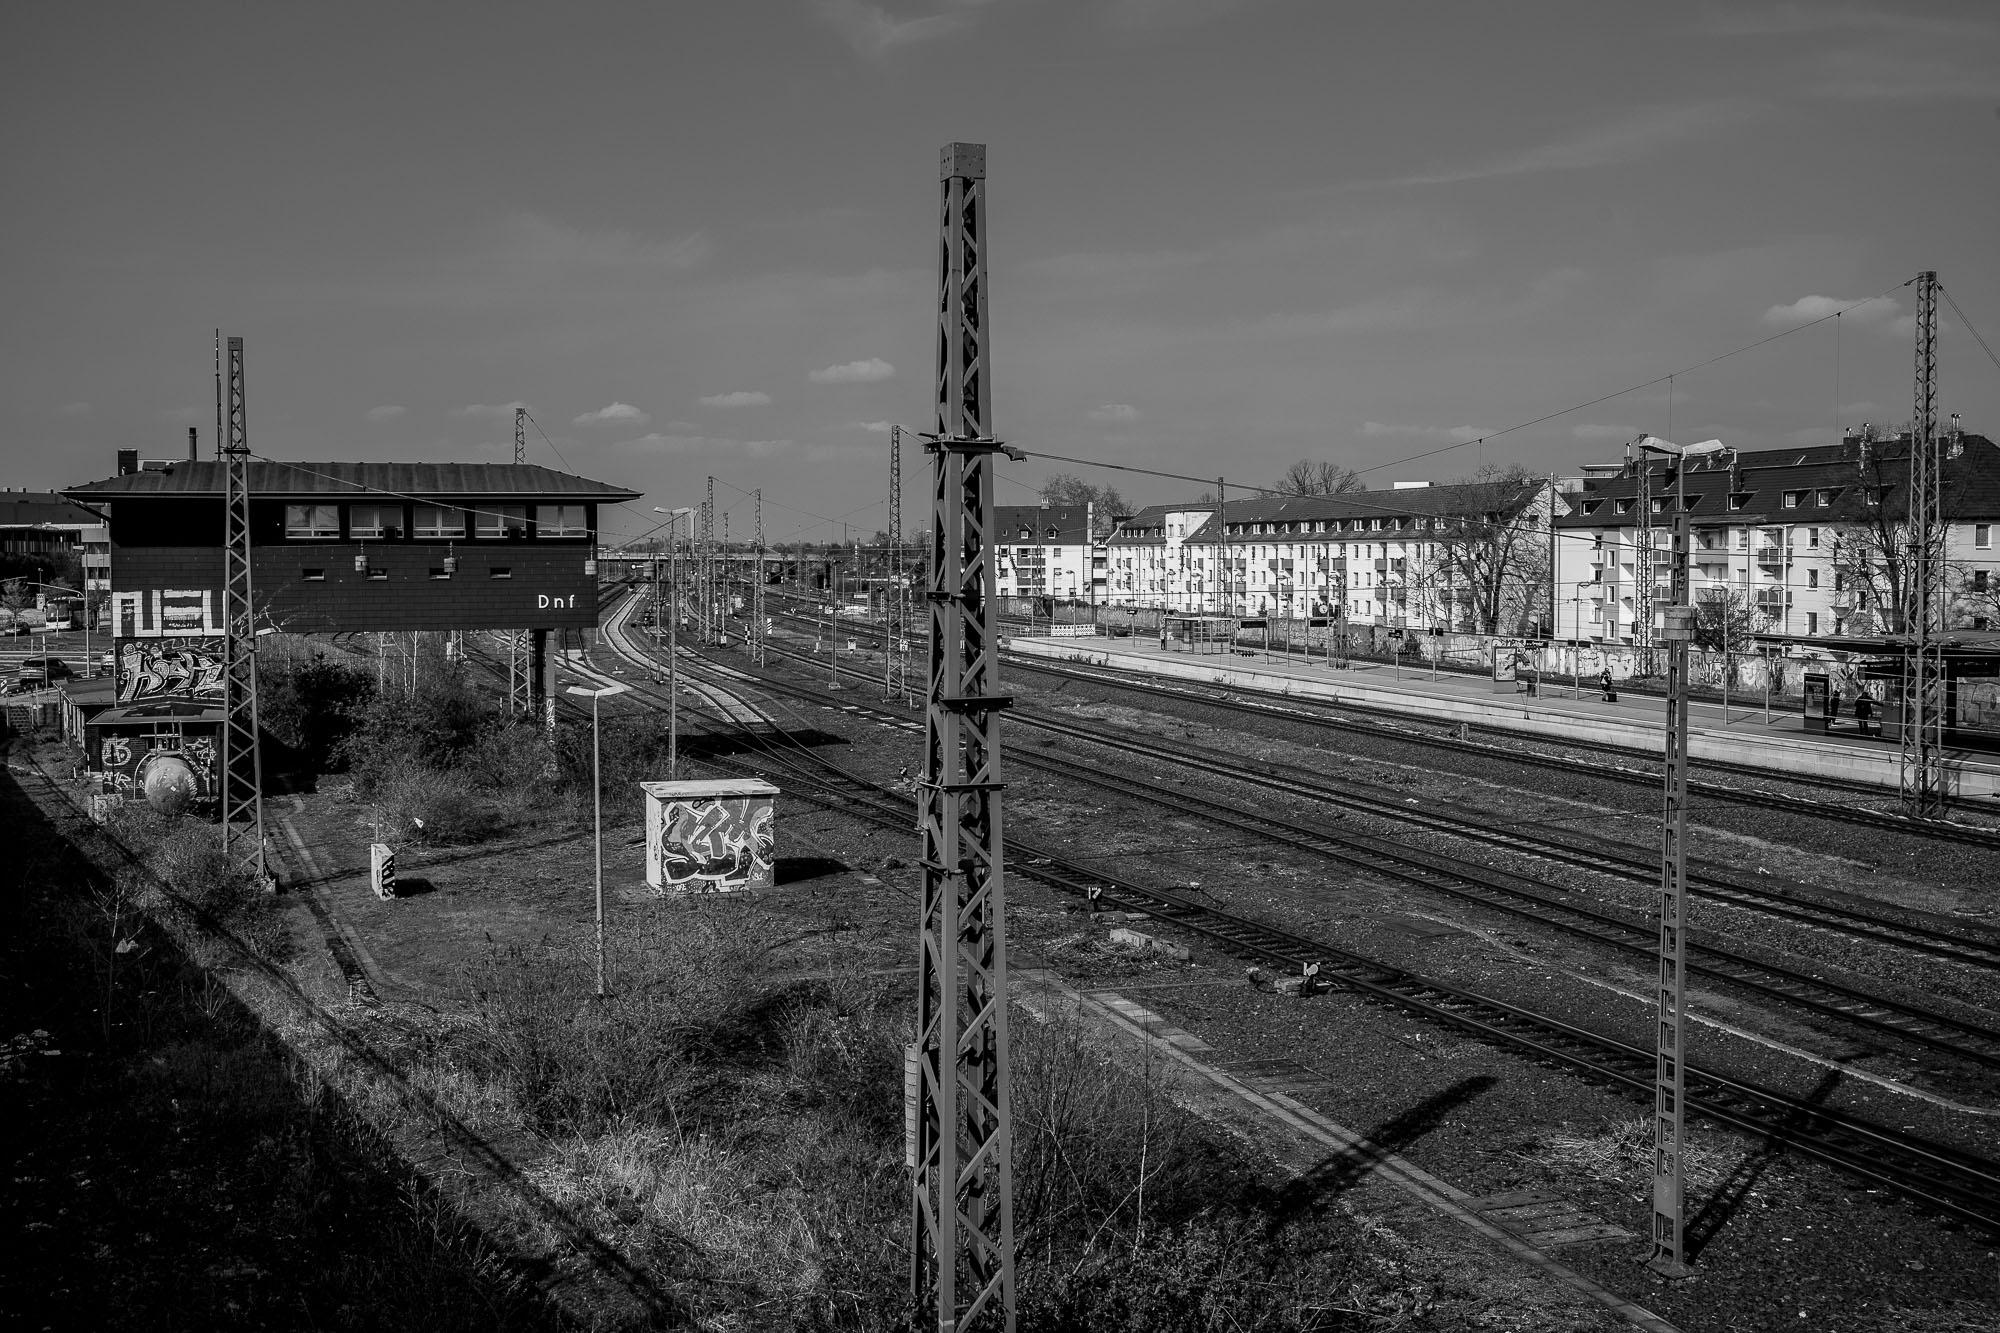 Düsseldorf train tracks